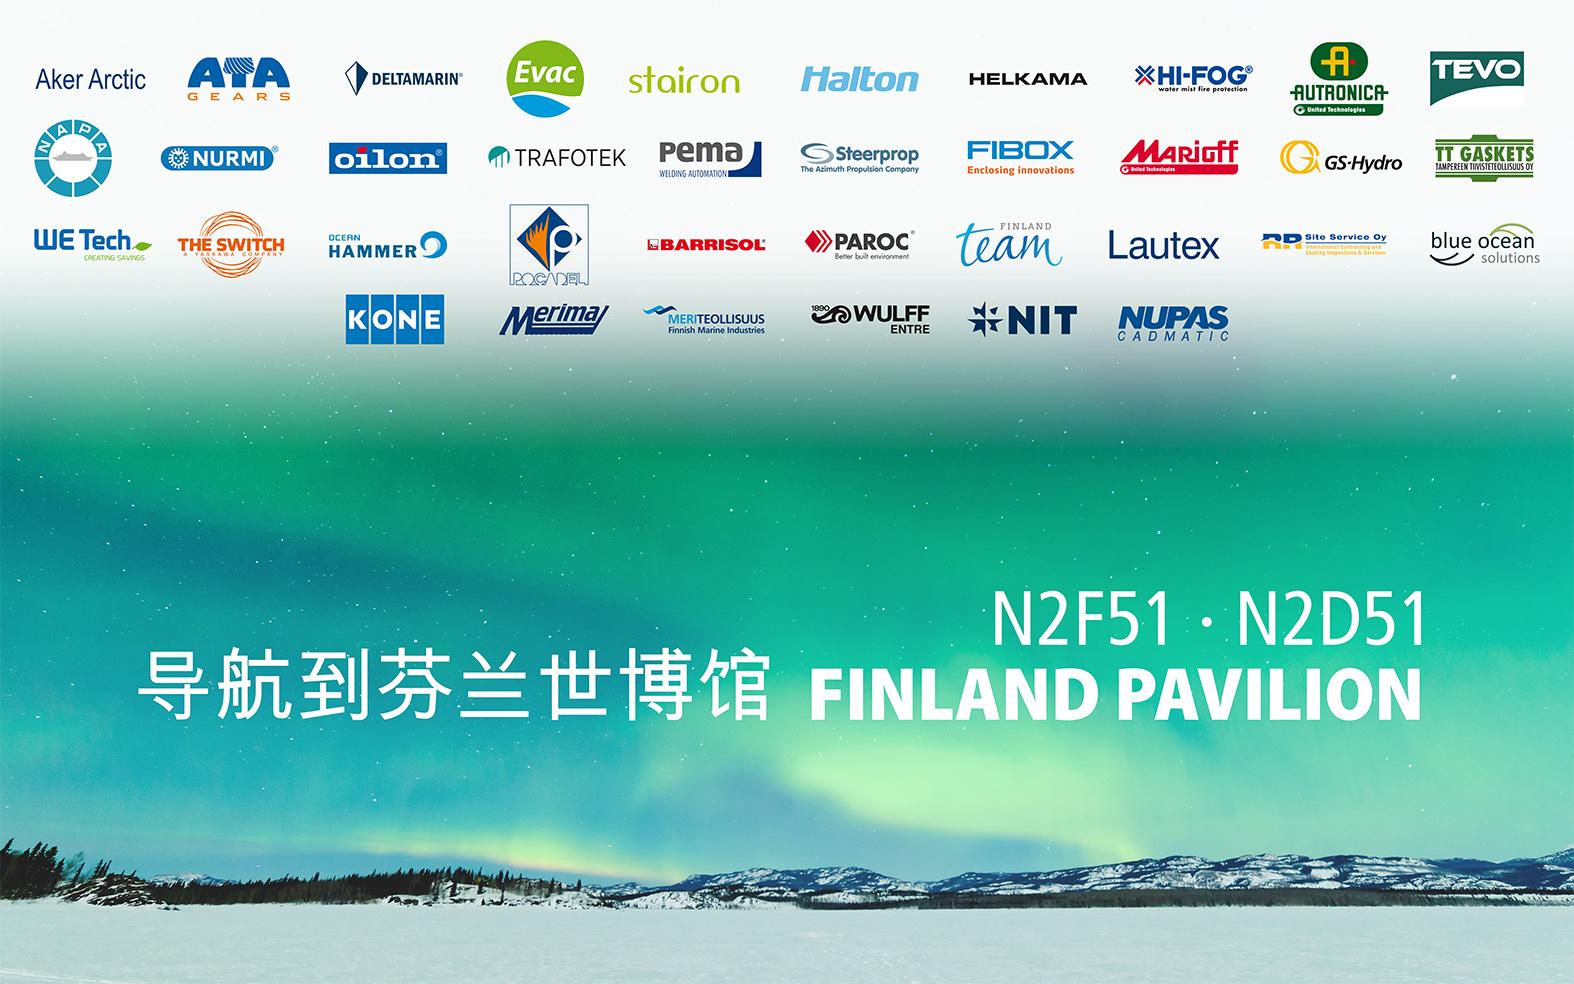 Wulff Entre Marintec China Finland Pavilion